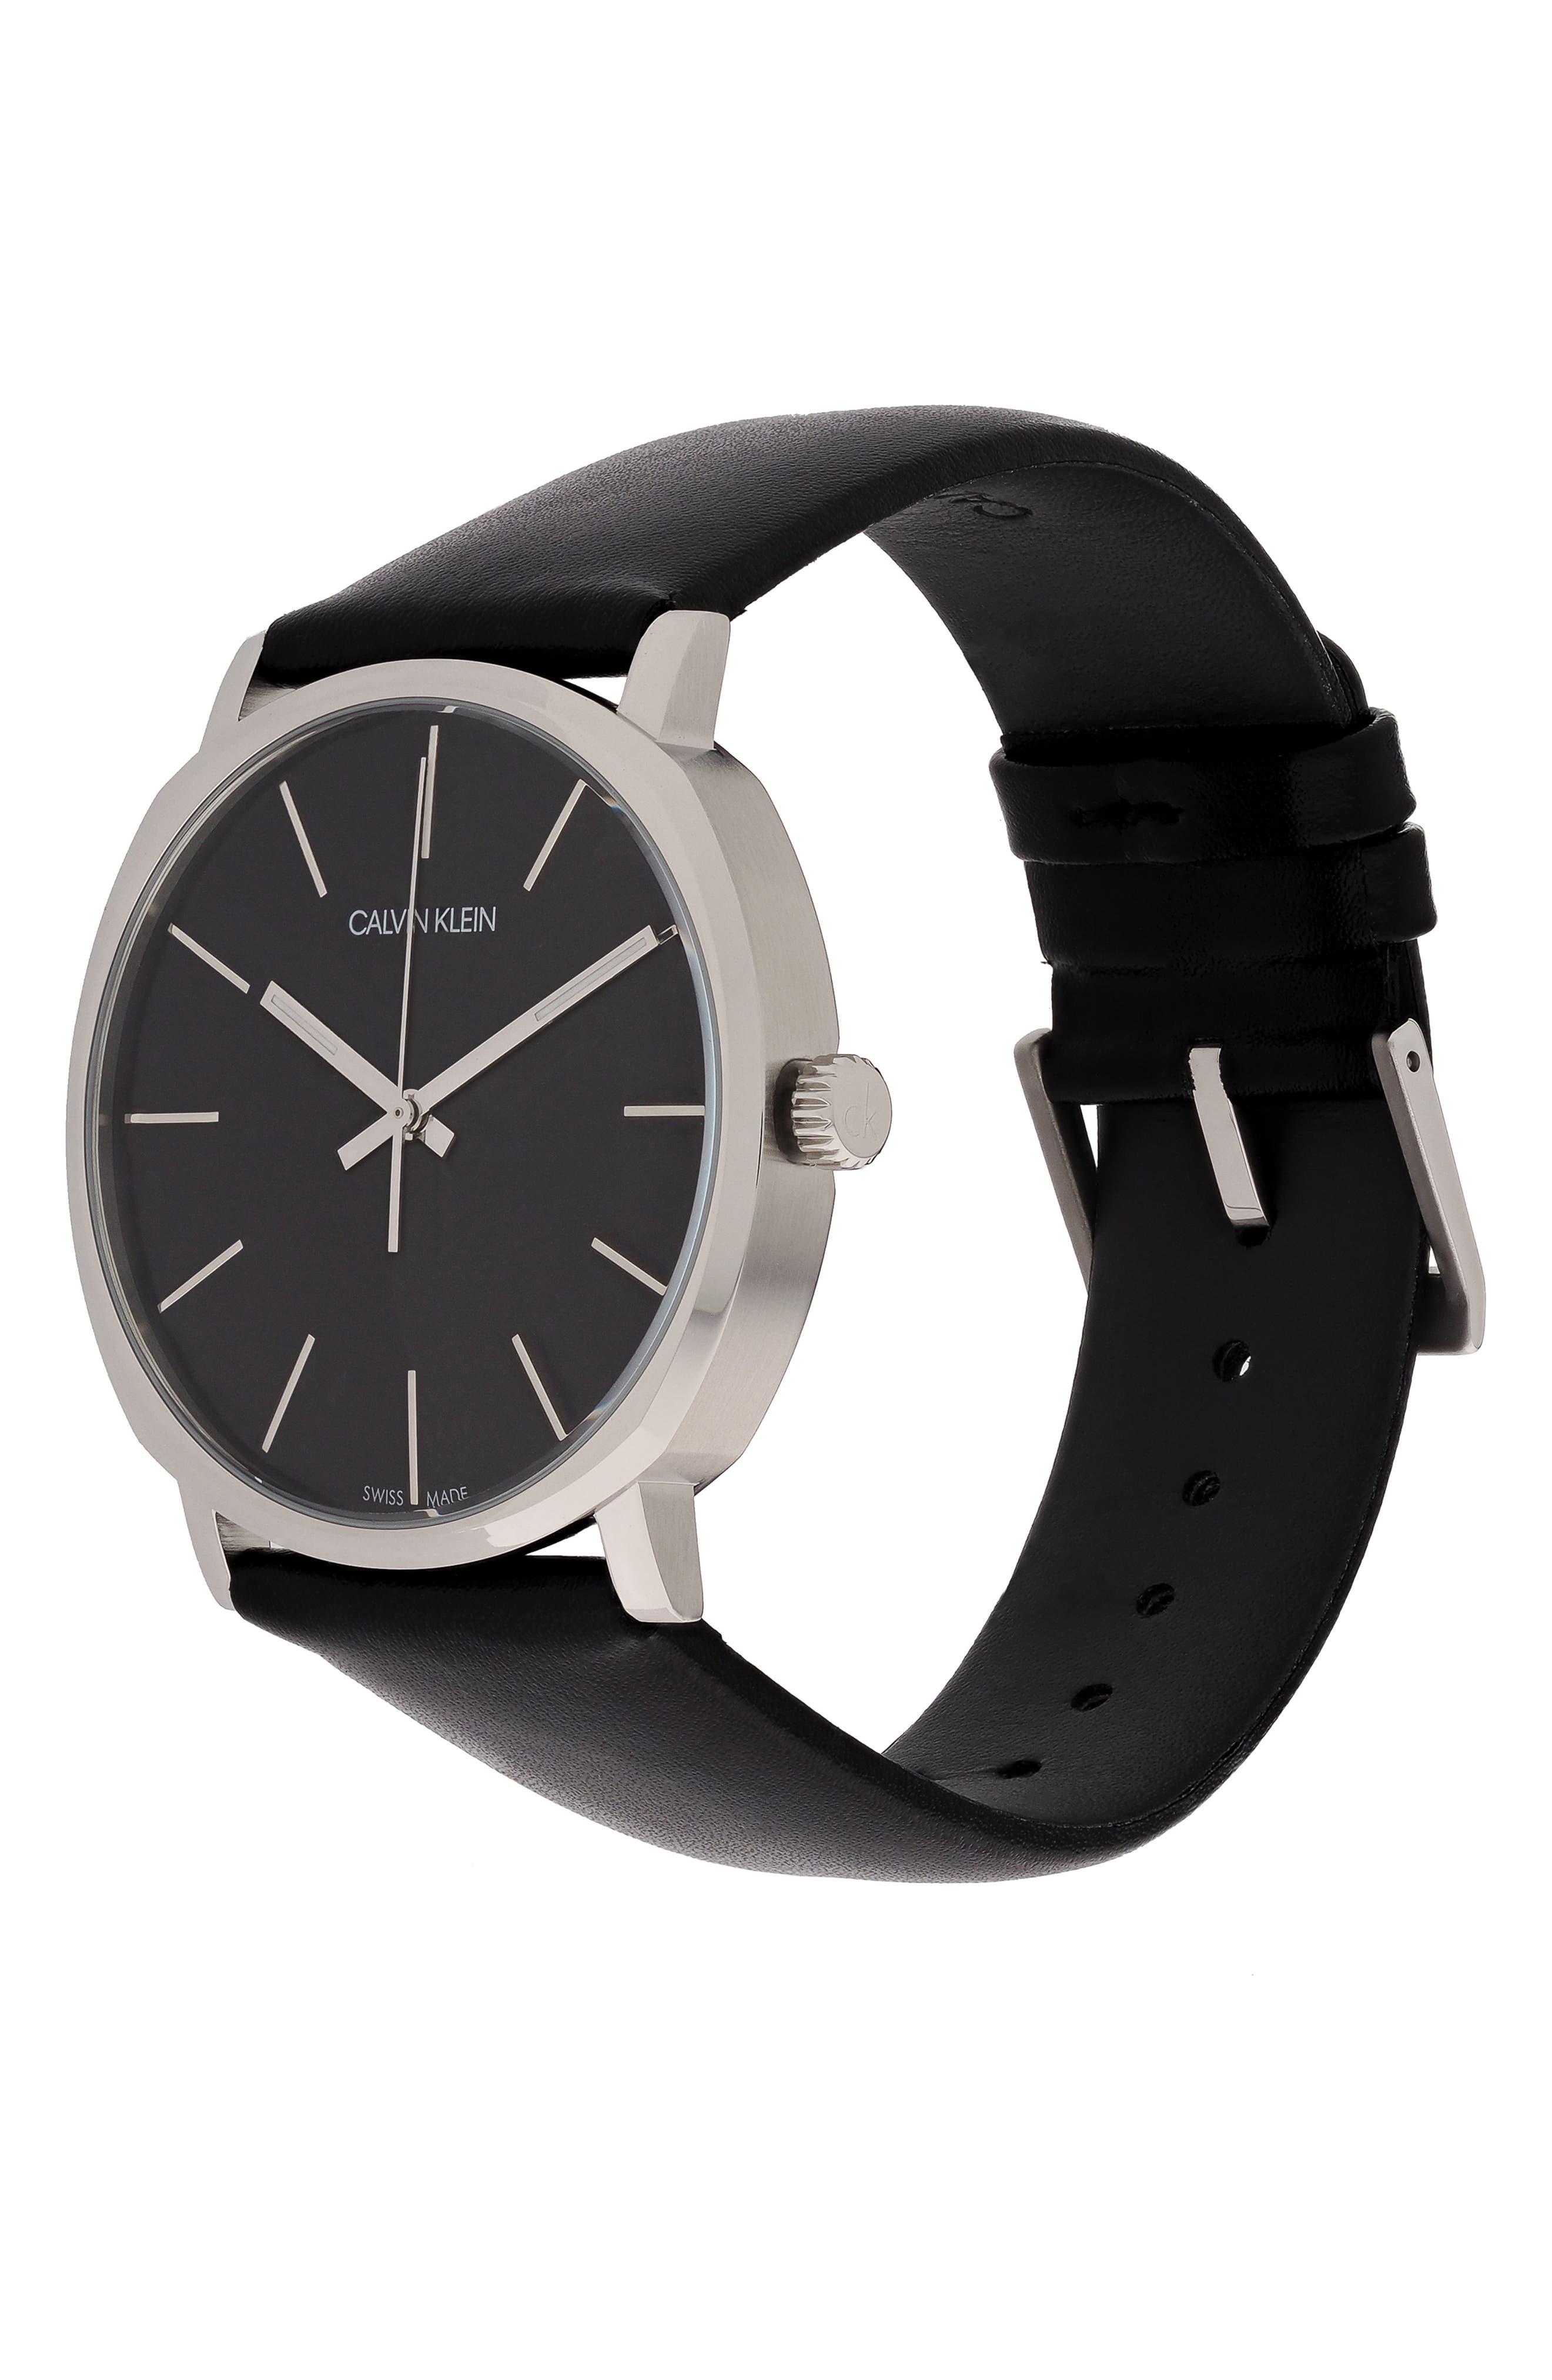 CALVIN KLEIN,                             Posh Leather Band Watch, 40mm,                             Alternate thumbnail 4, color,                             BLACK/ SILVER/ BLACK